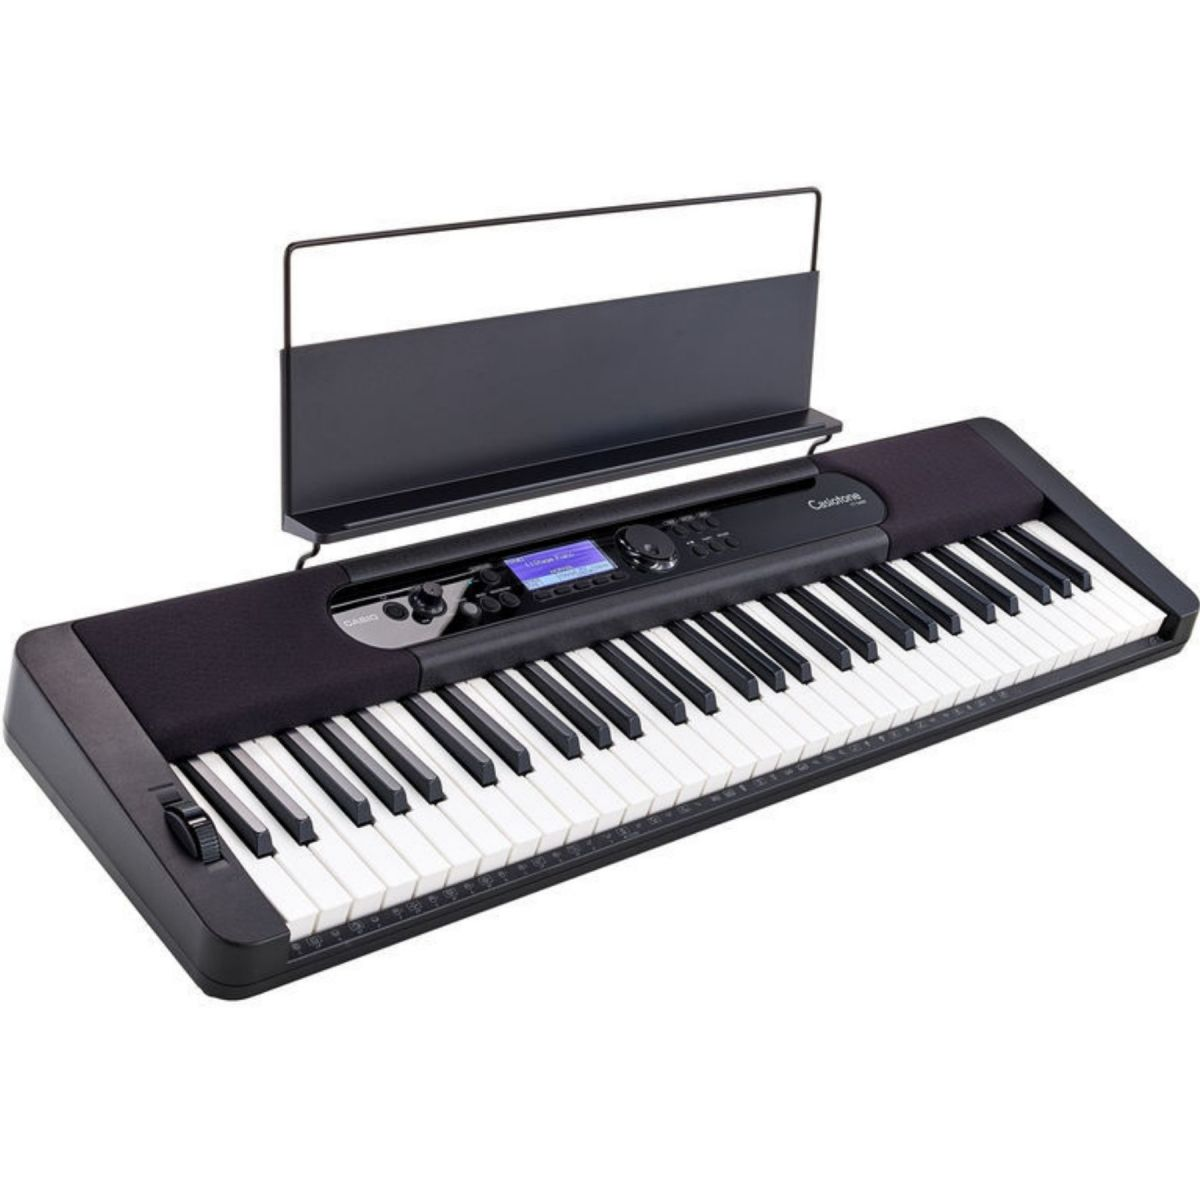 Tastiera Arranger Casio CT-S400 61 tasti black